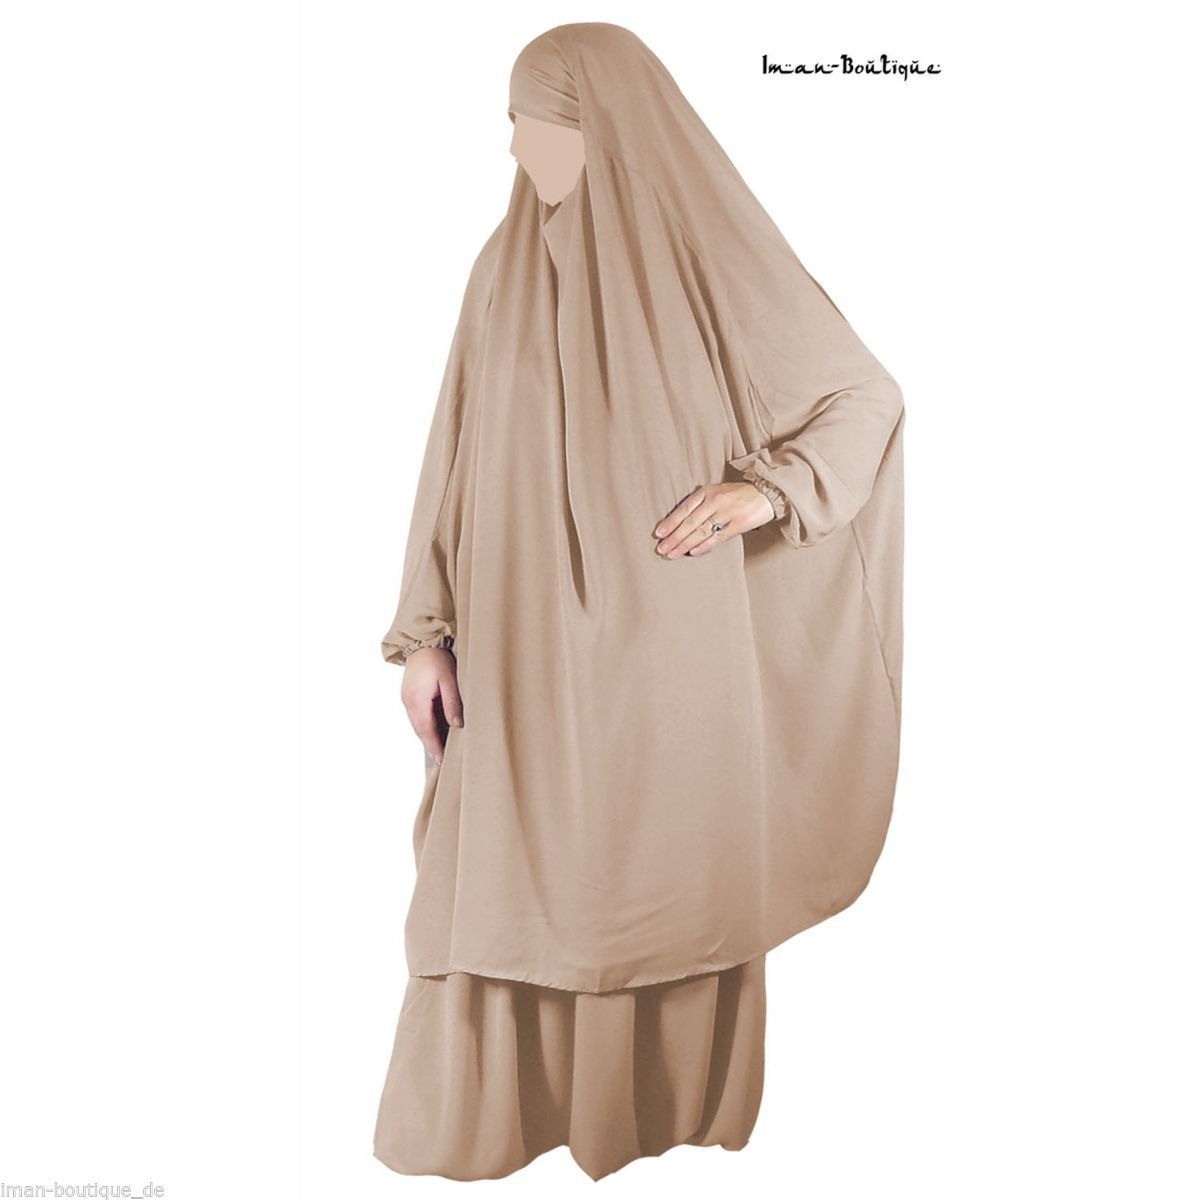 Islamische Kleidung Khimarset Jilbab Mit Rock Hose Abaya